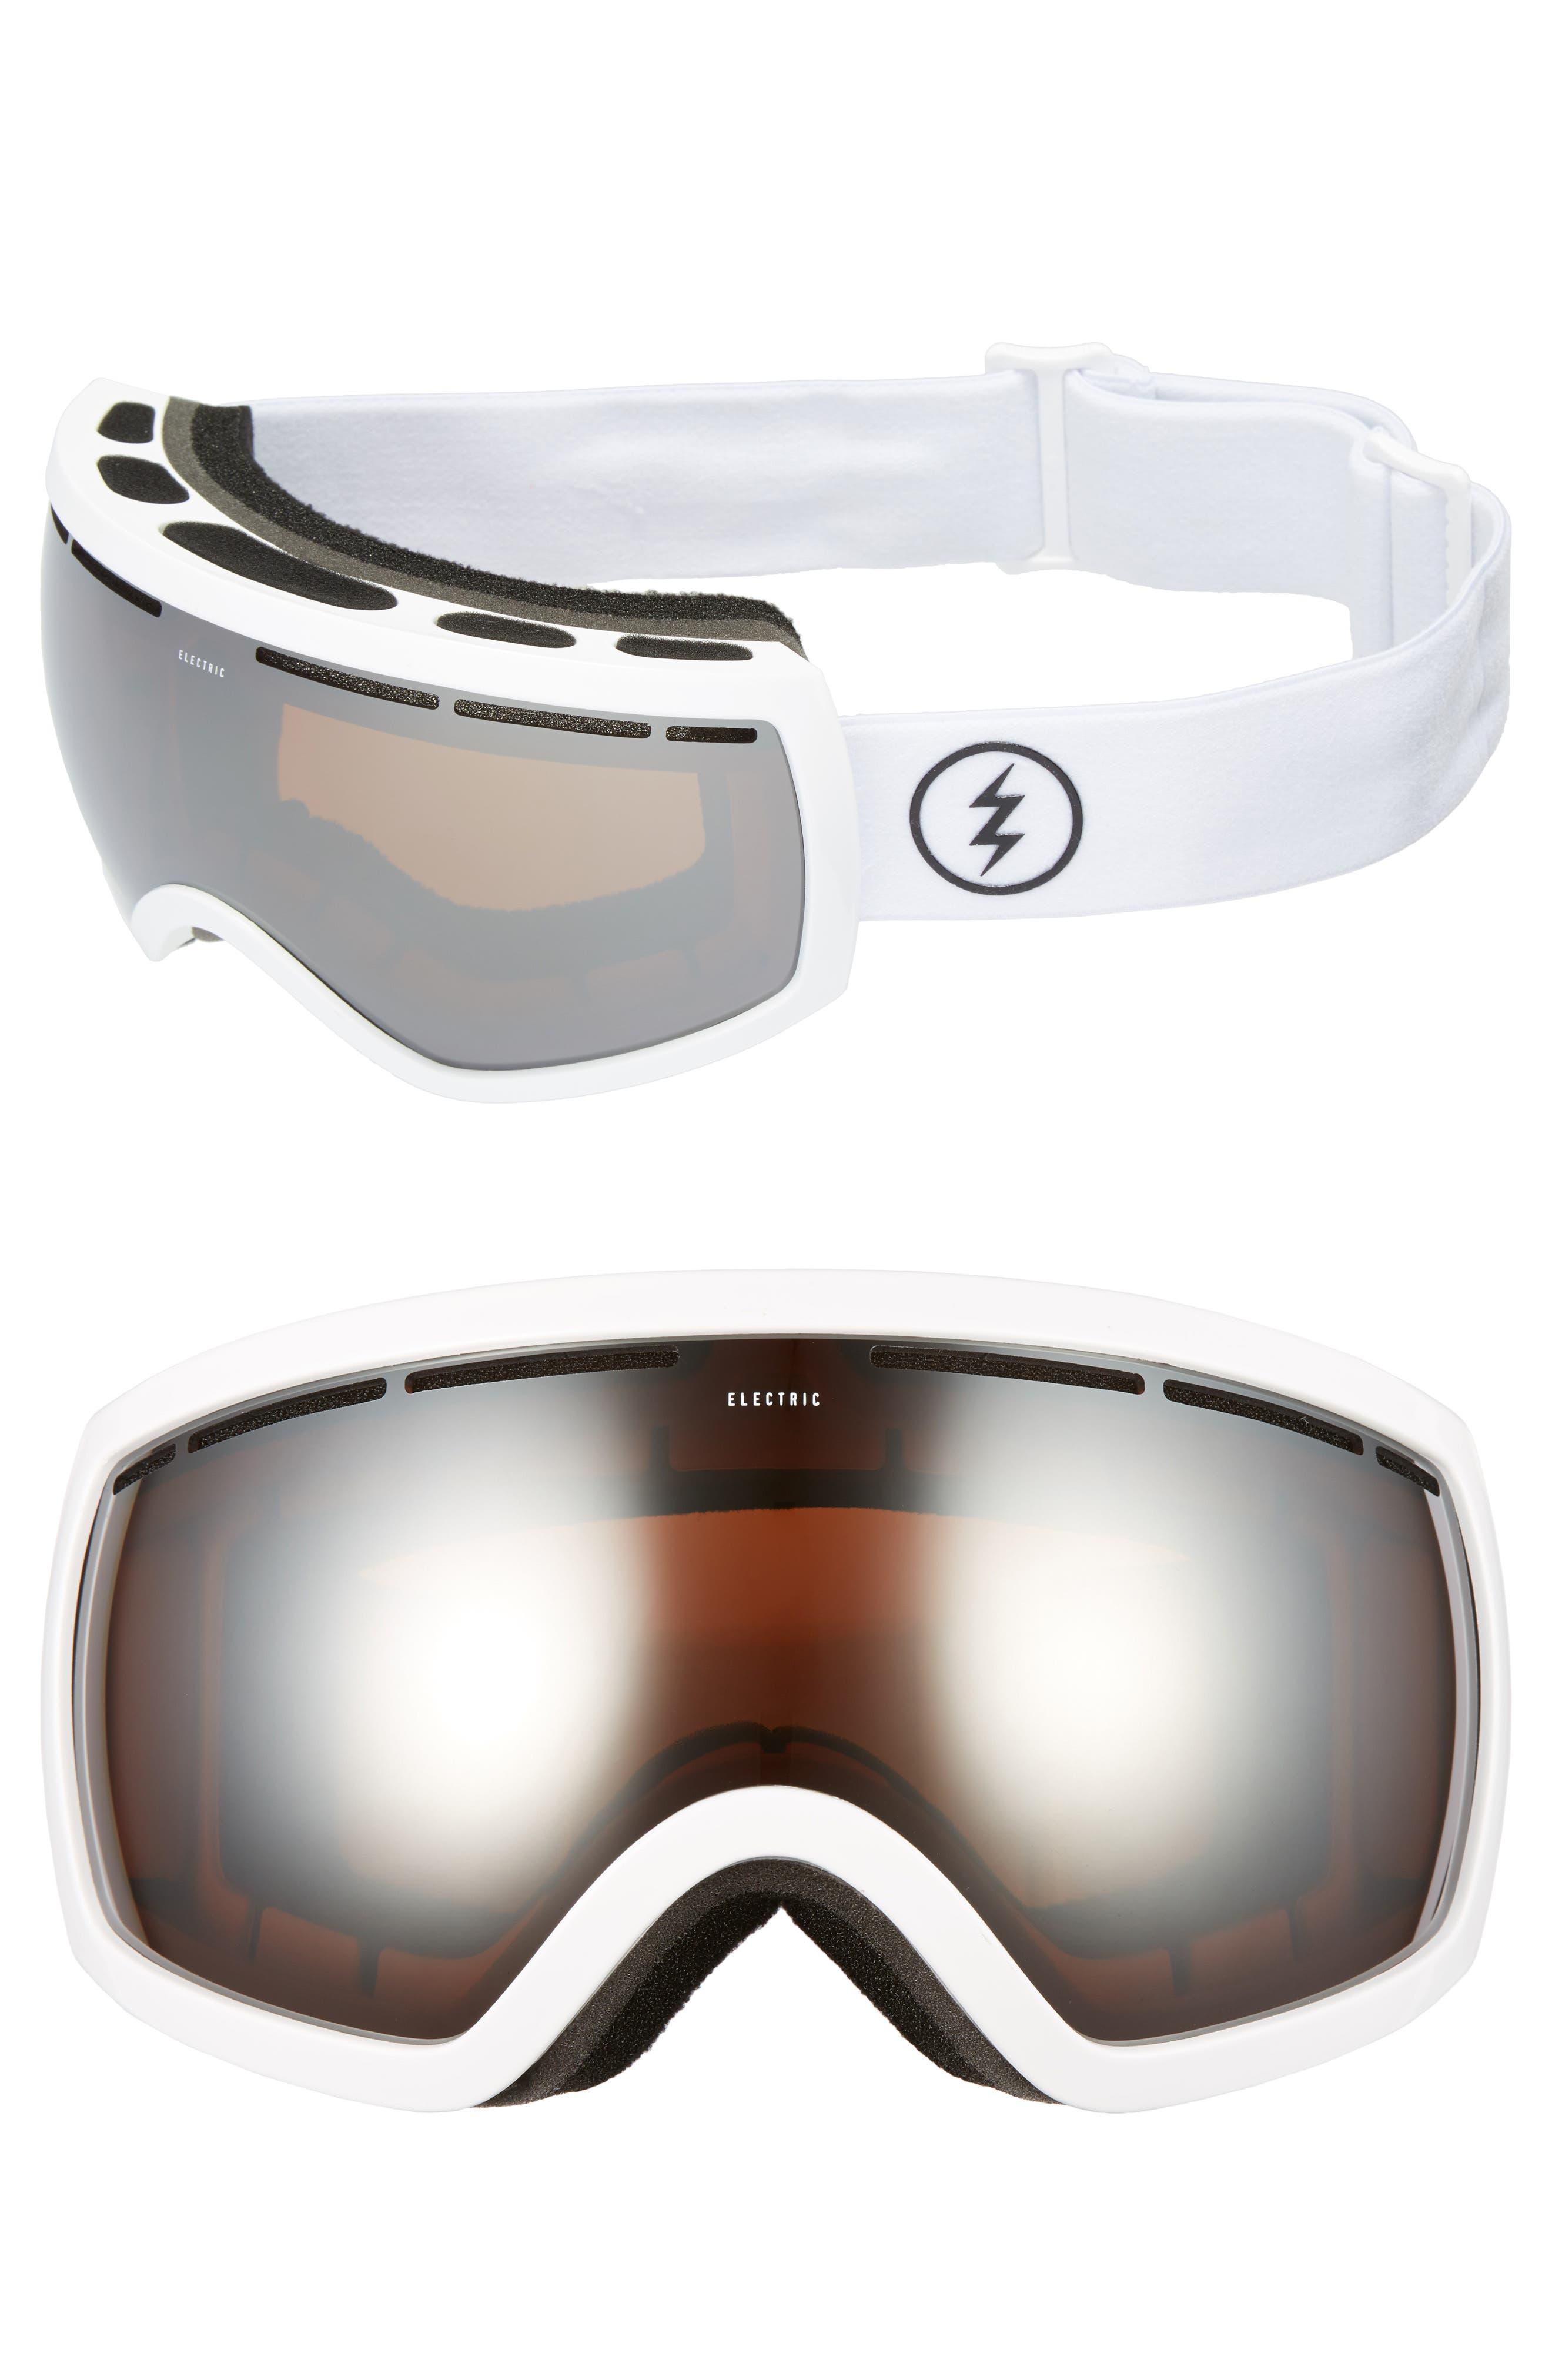 ELECTRIC EG 2.5 215mm Snow Goggles